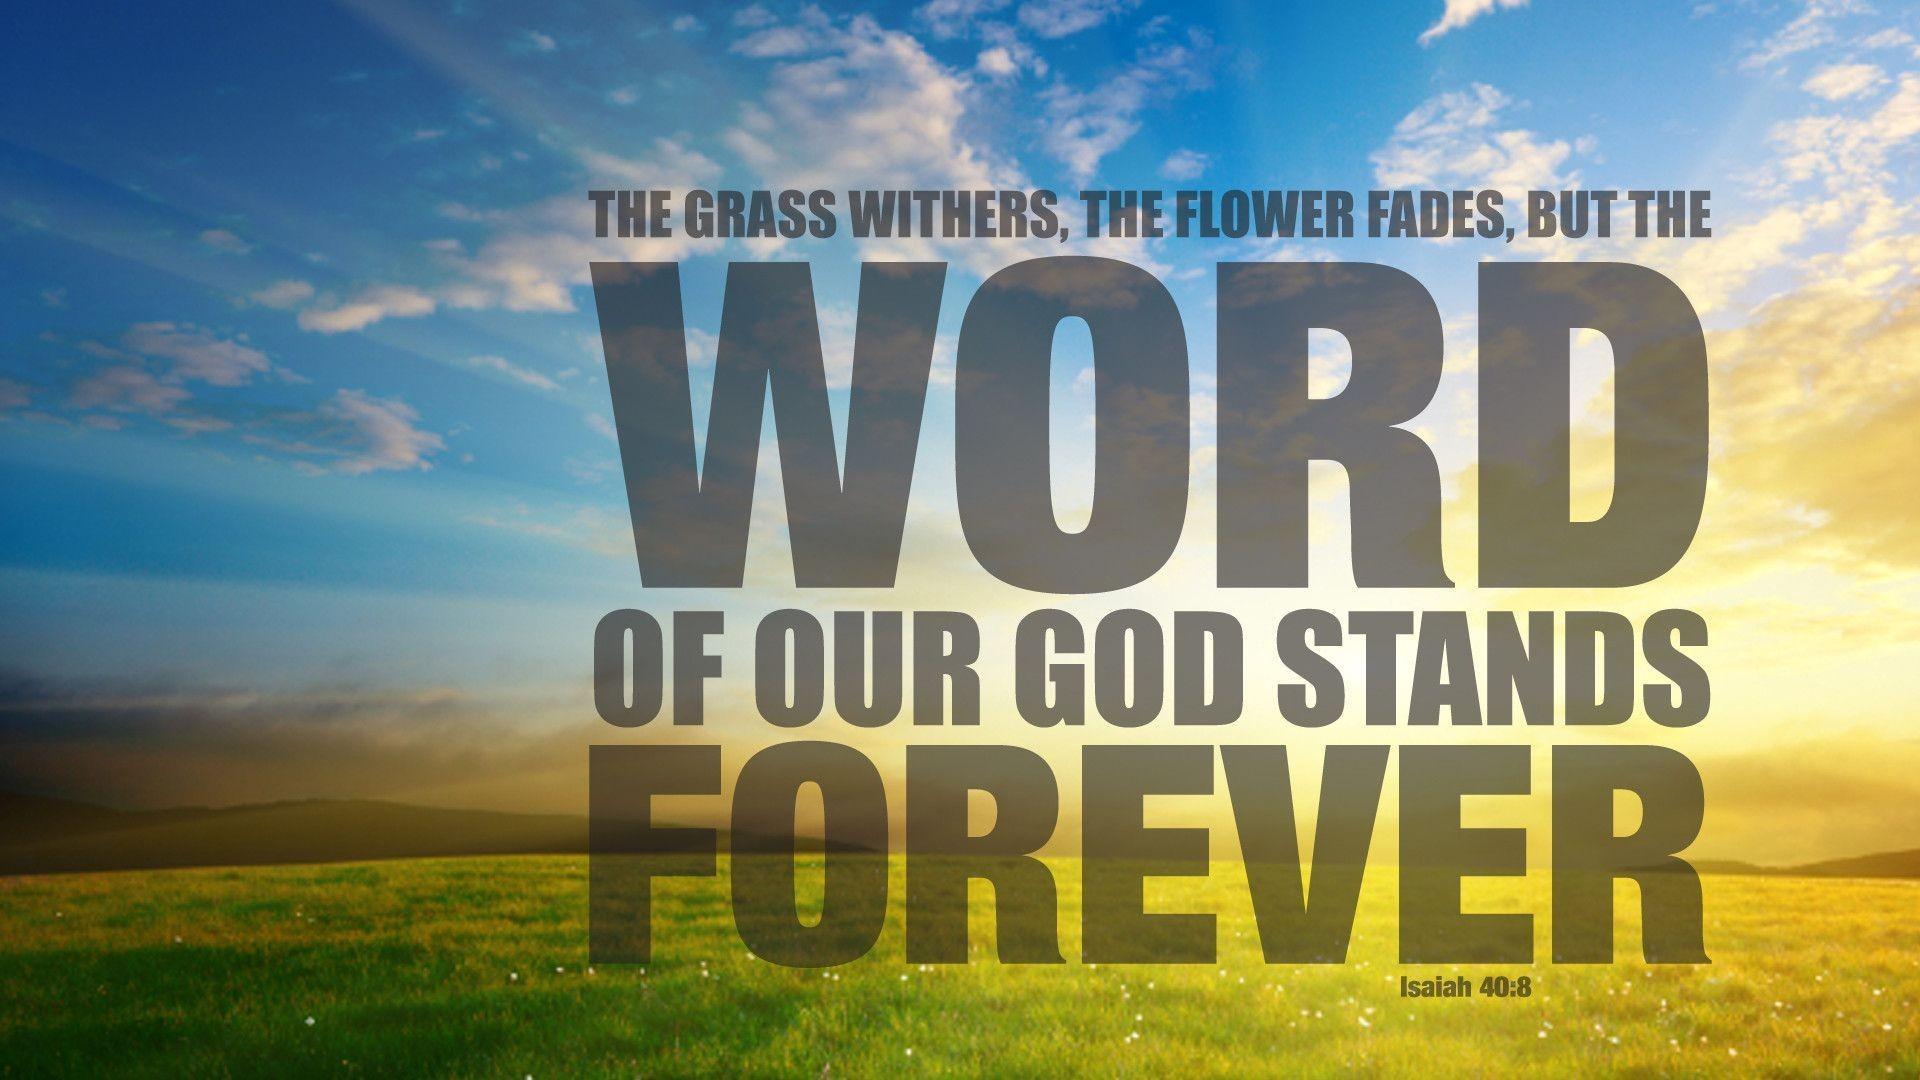 Christian Bible Verses Wallpaper Downloadcom